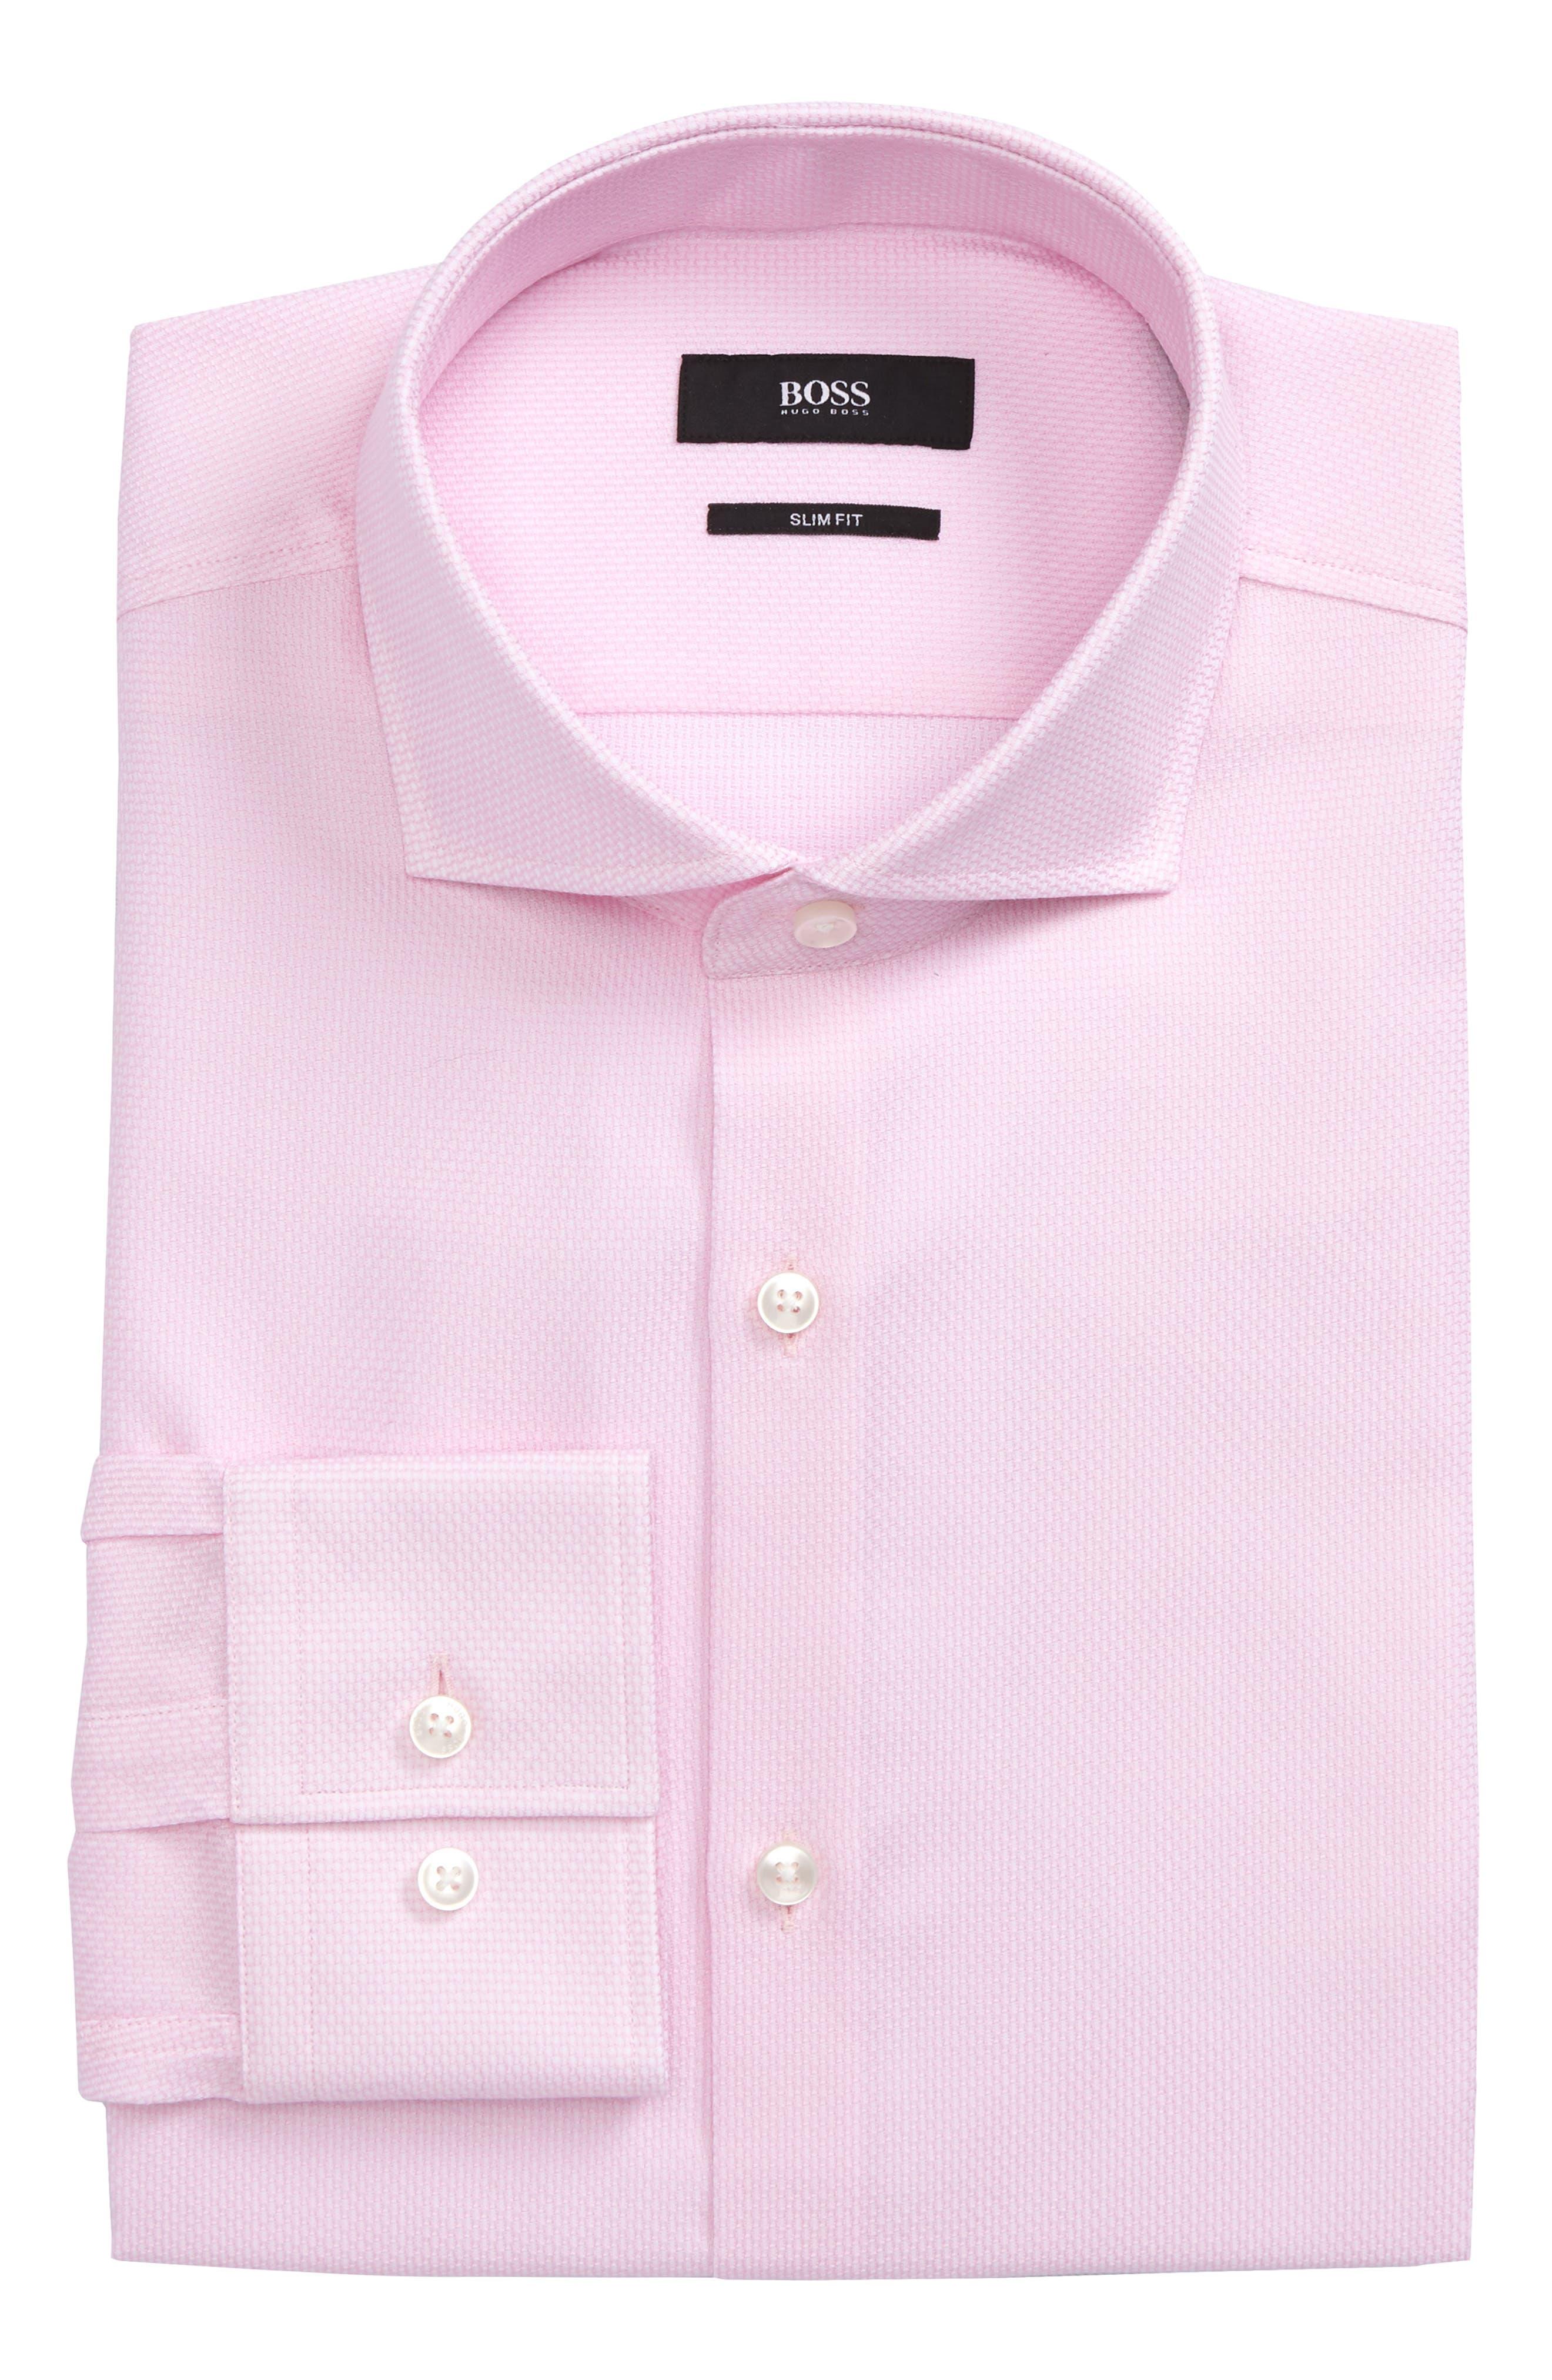 BOSS Jason Slim Fit Solid Dress Shirt